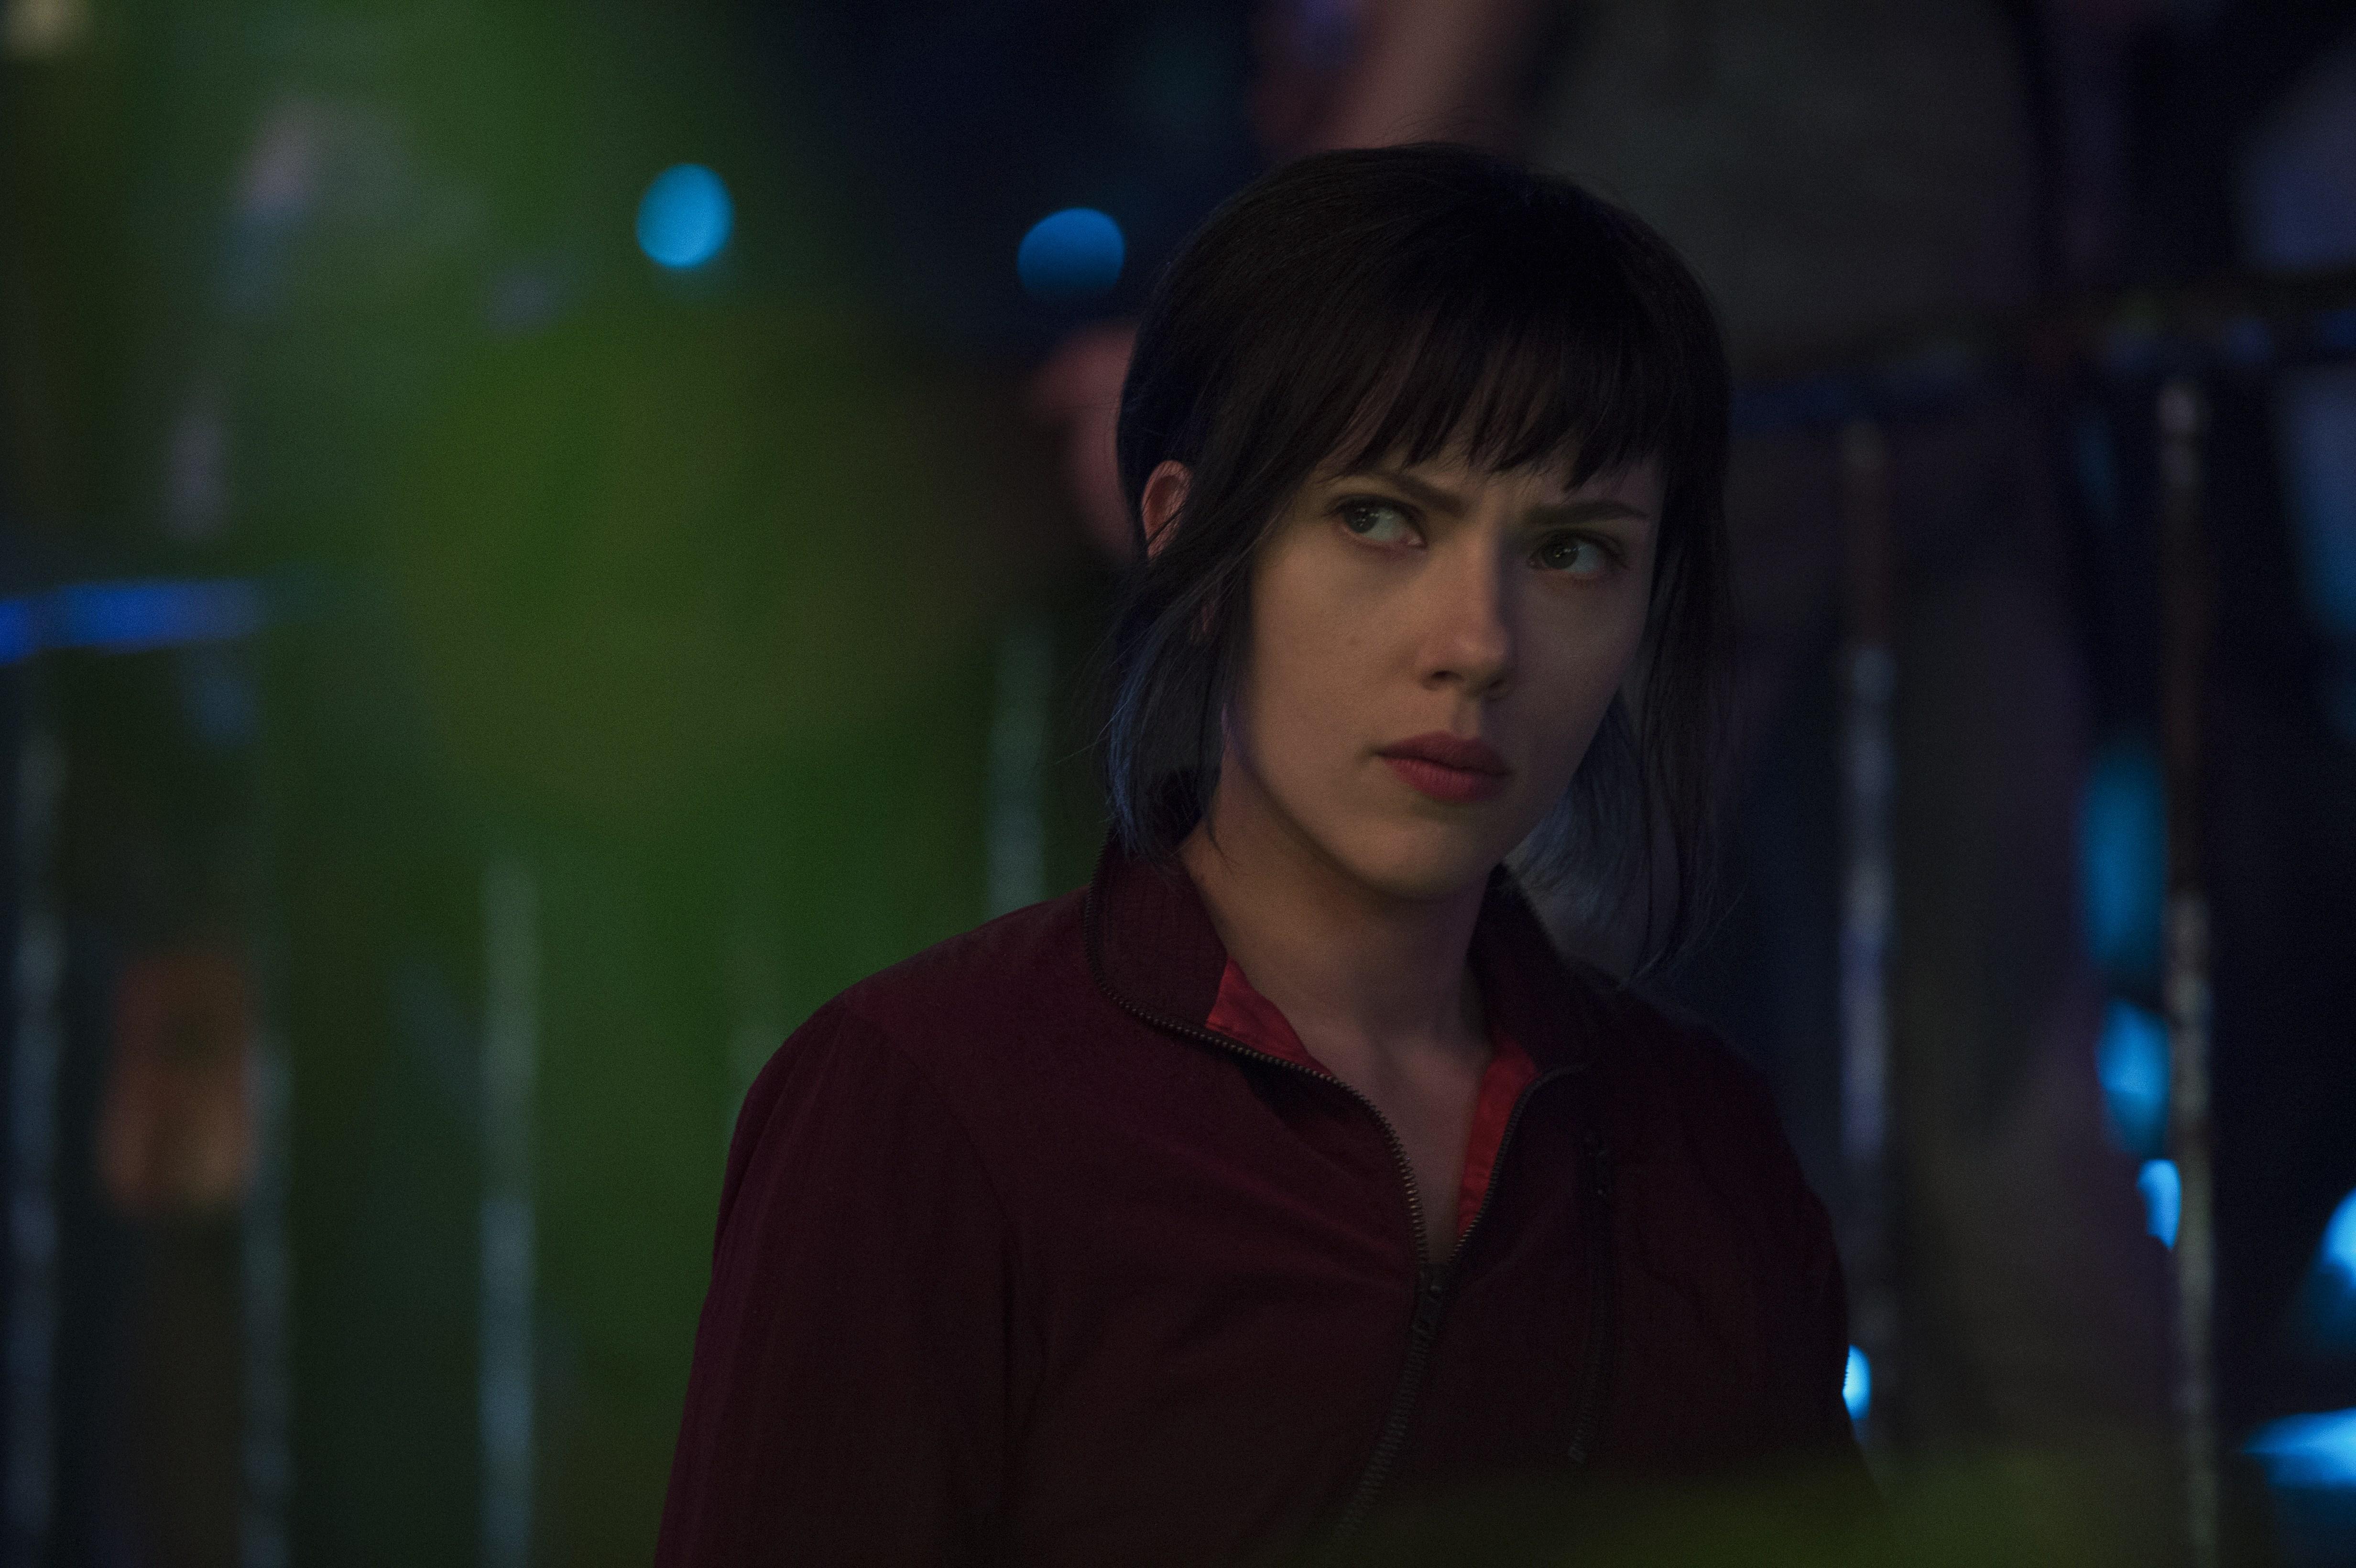 Scarlett Johansson As Major Ghost In Shell 2017, HD Movies